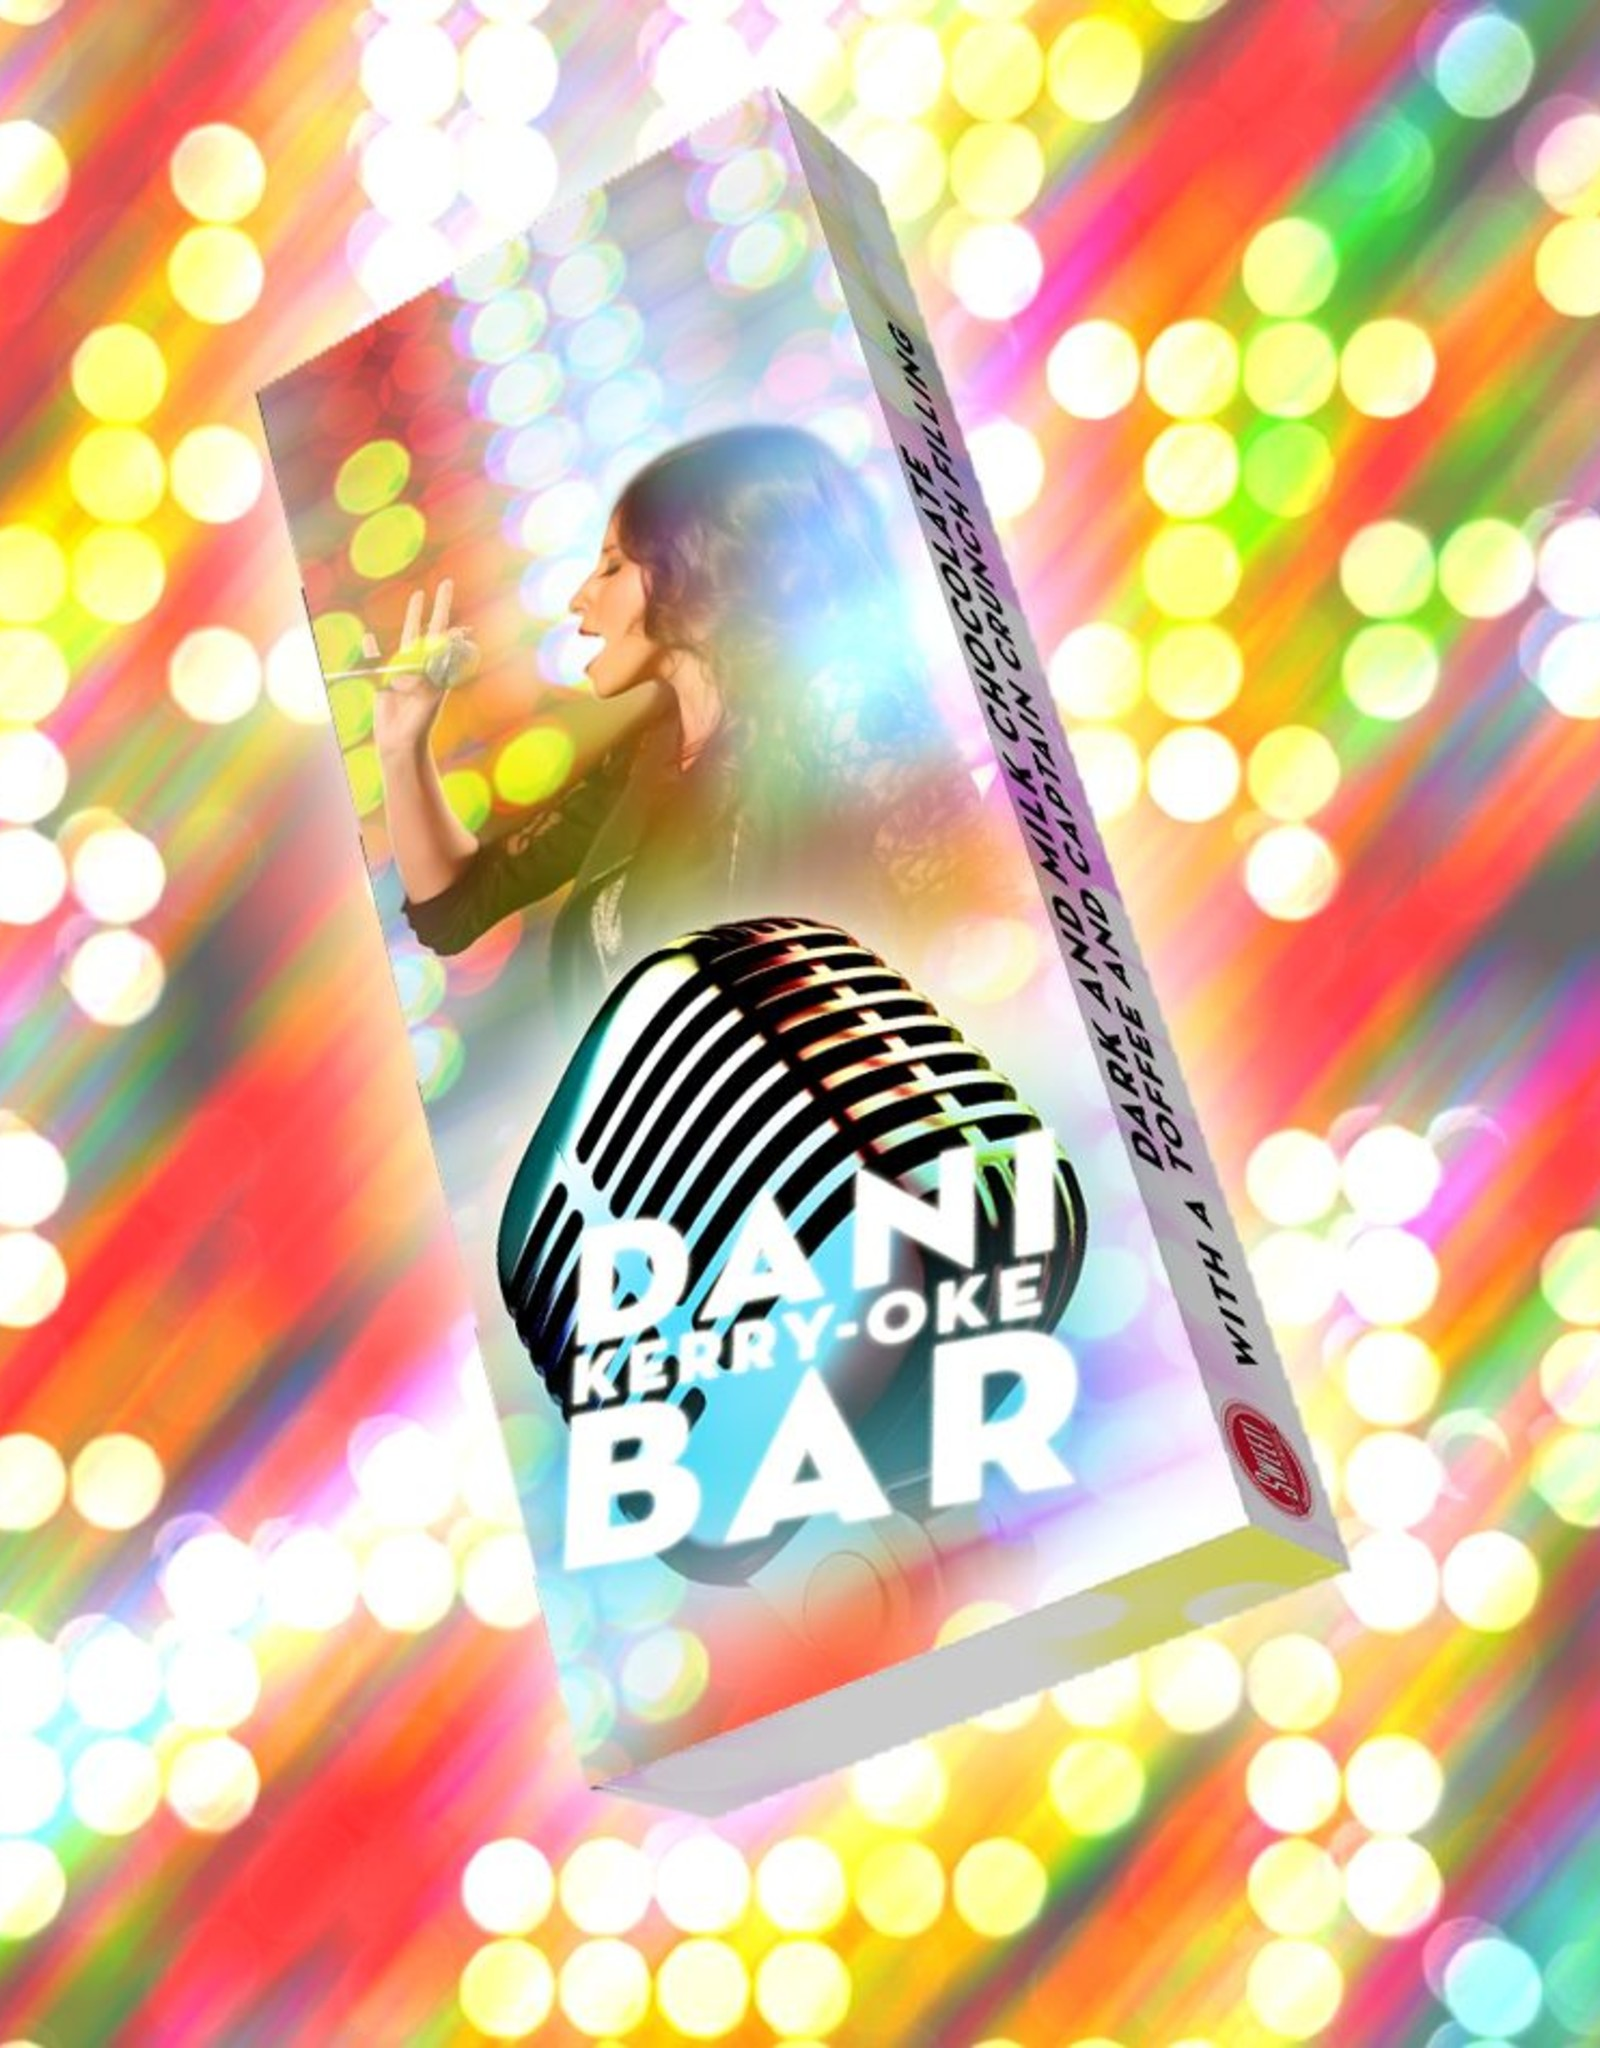 Dani Kerry-Oke Bar